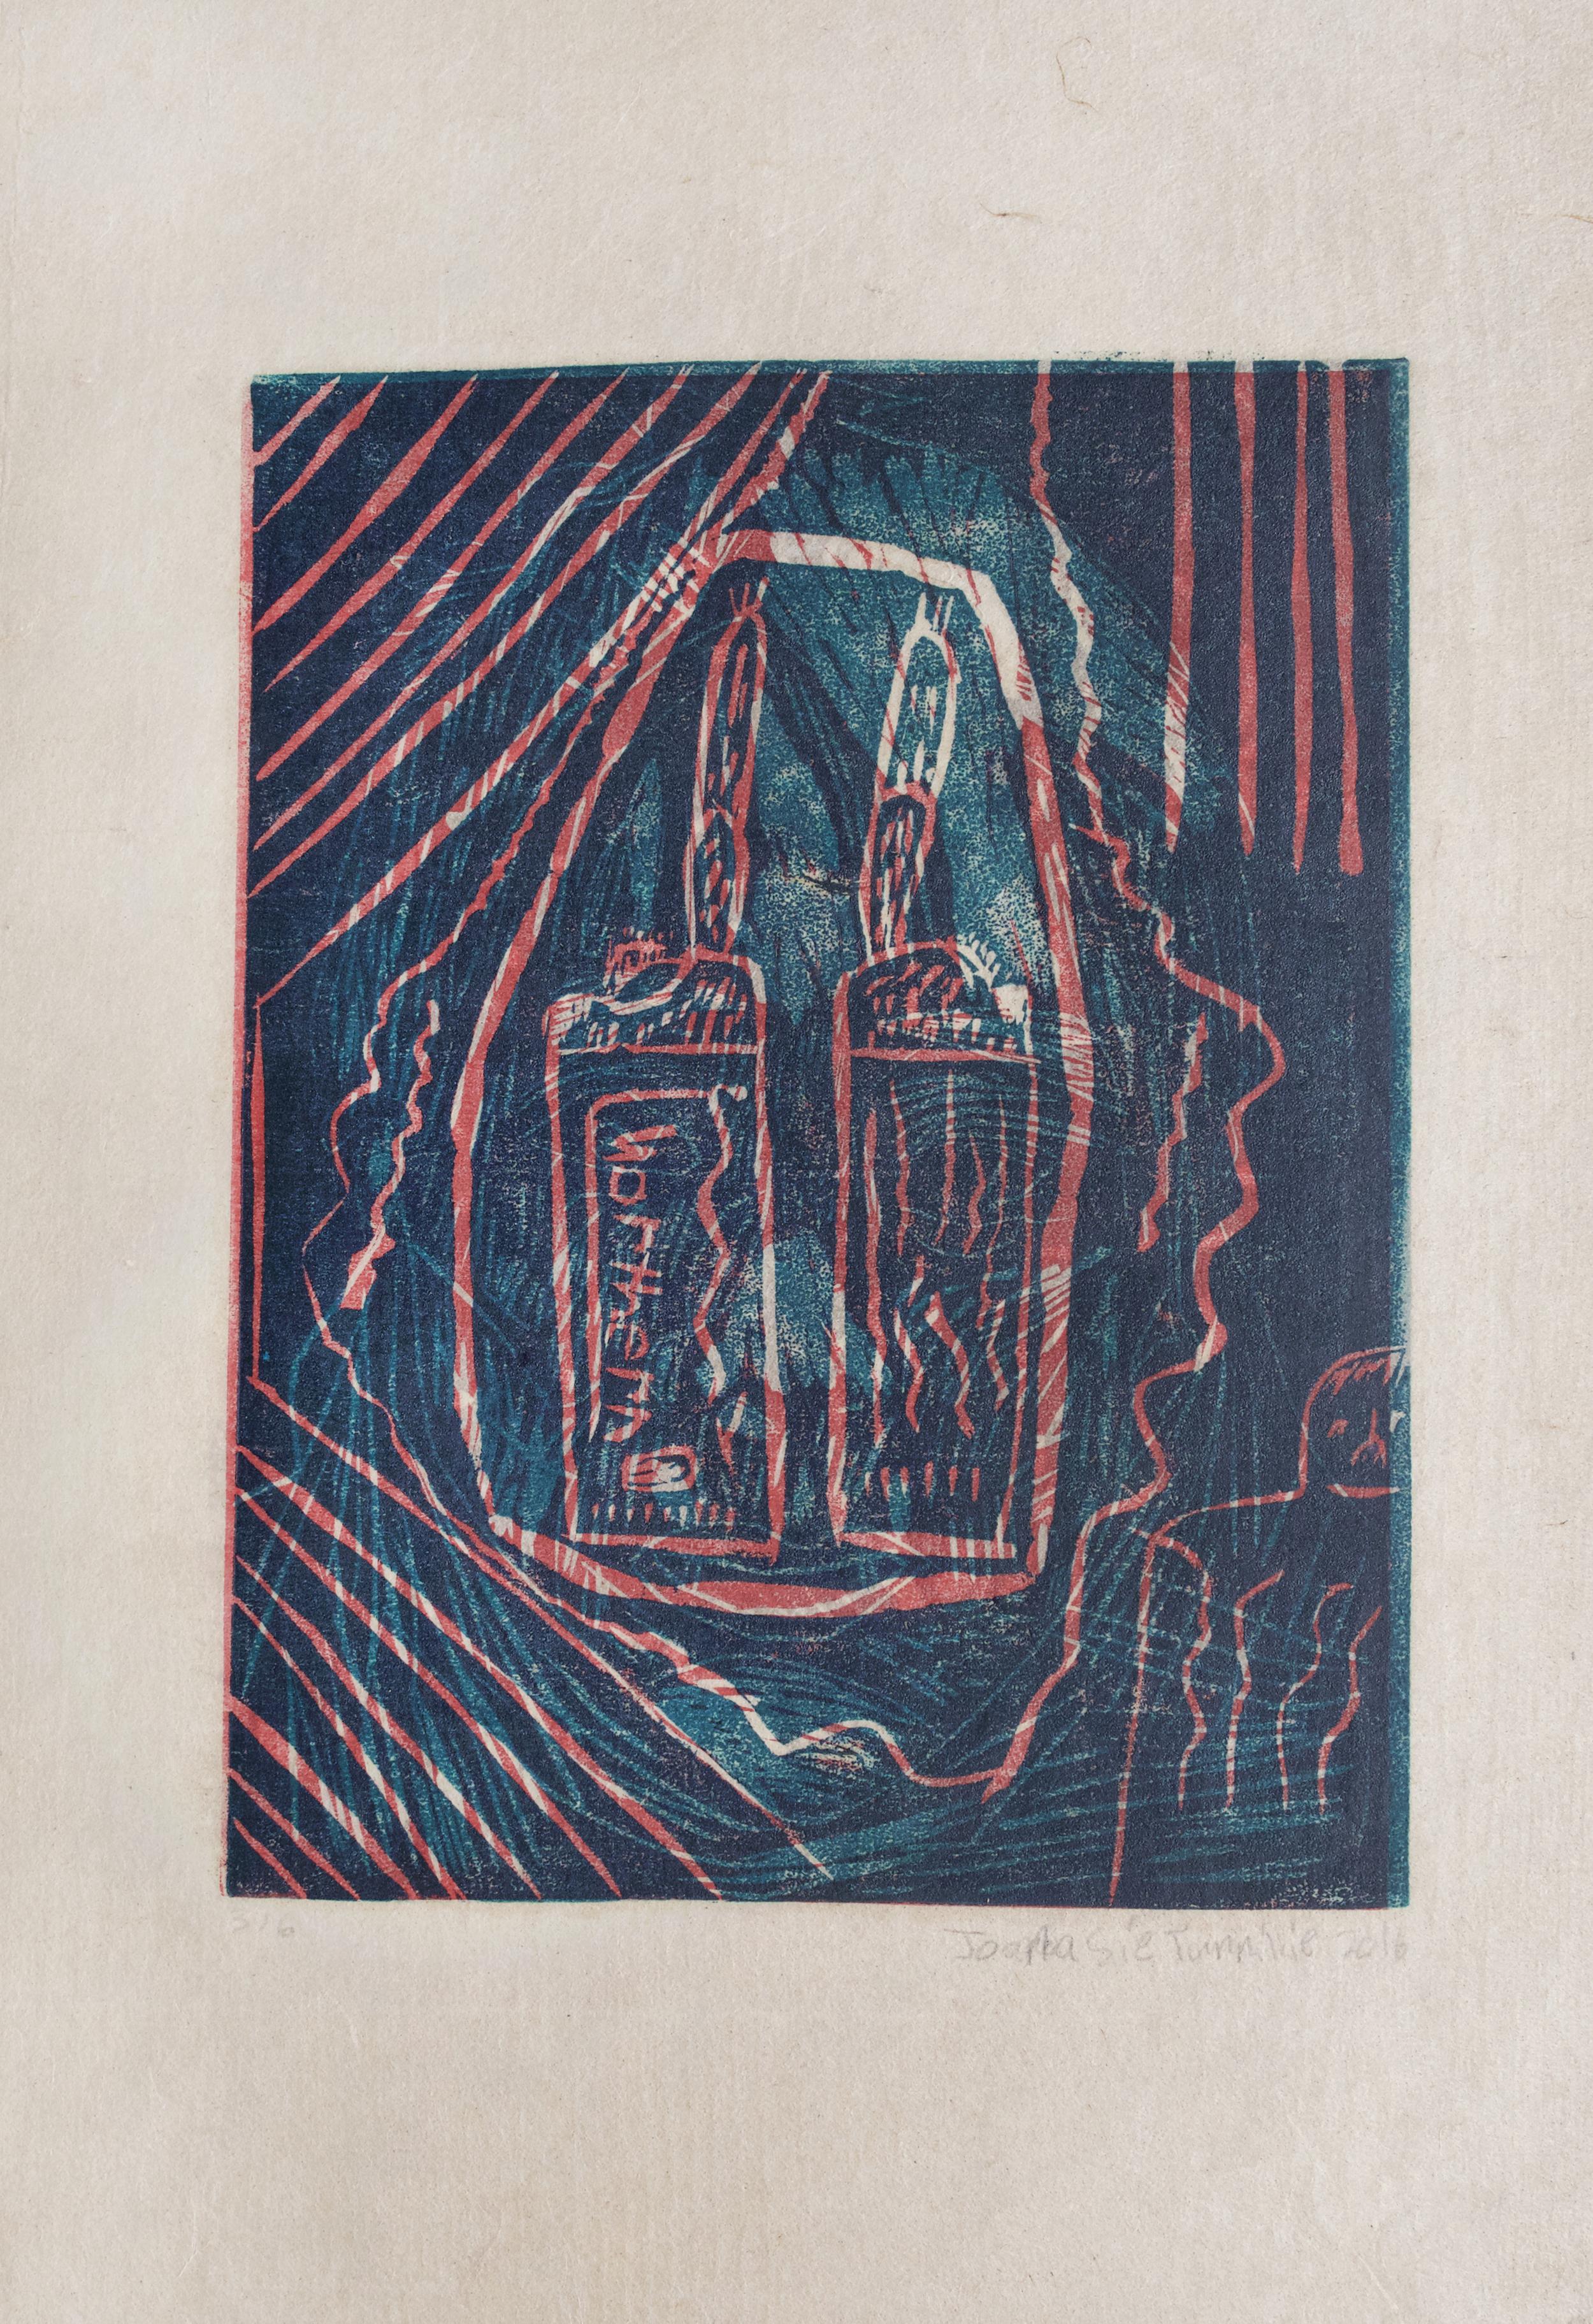 "Lighters   Joanasie Tunnillie  Two-Layer Linocut on Washi  15.5 x 21.5"""